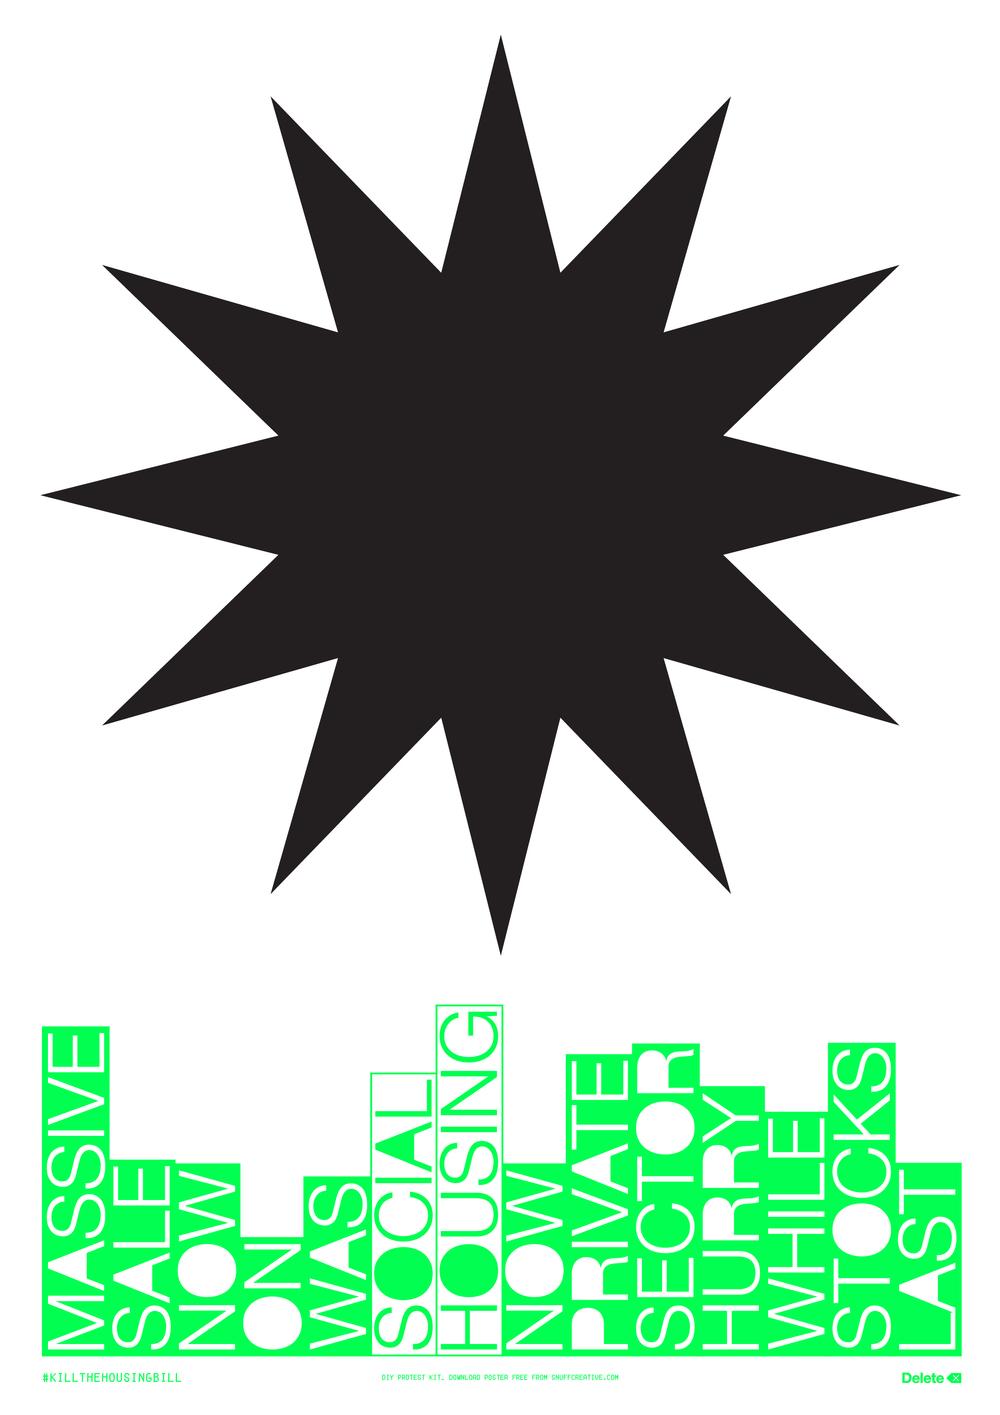 MASSIVE SALE TYPE POSTER_BLACK1-01.jpg